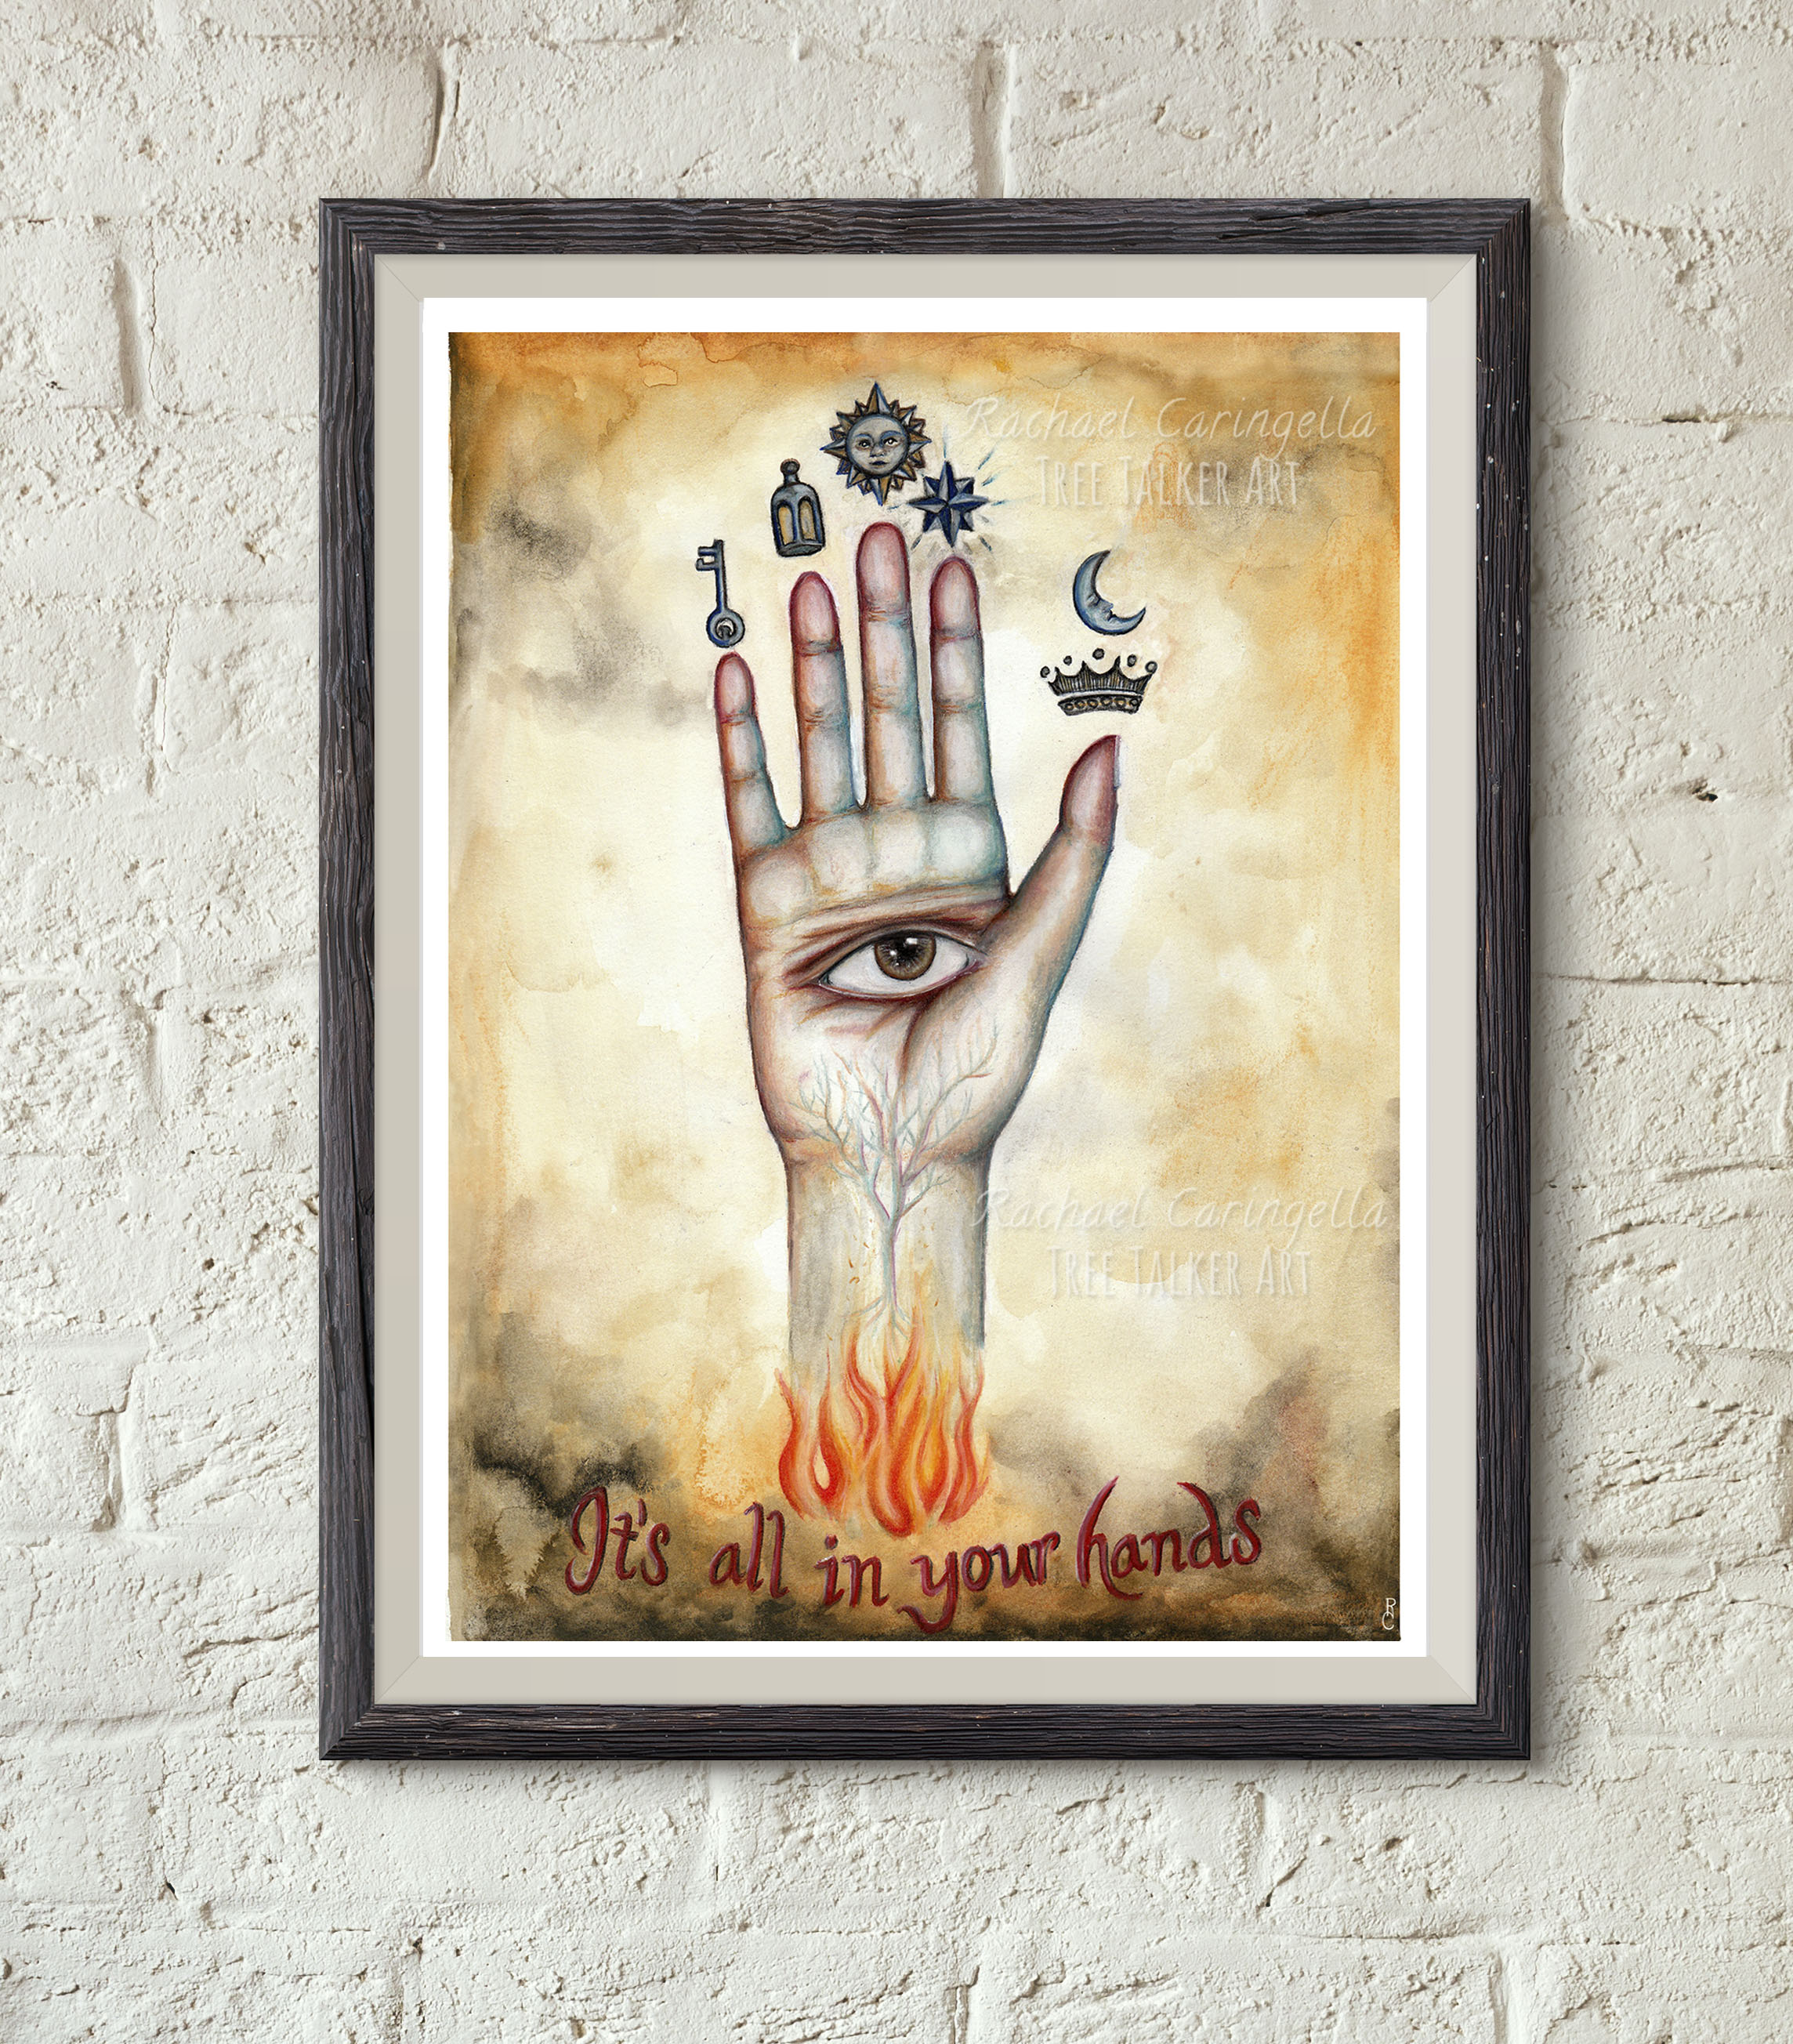 Alchemical Hand - Mixed Media Psychic Sign by Rachael Caringella   Tree Talker Art